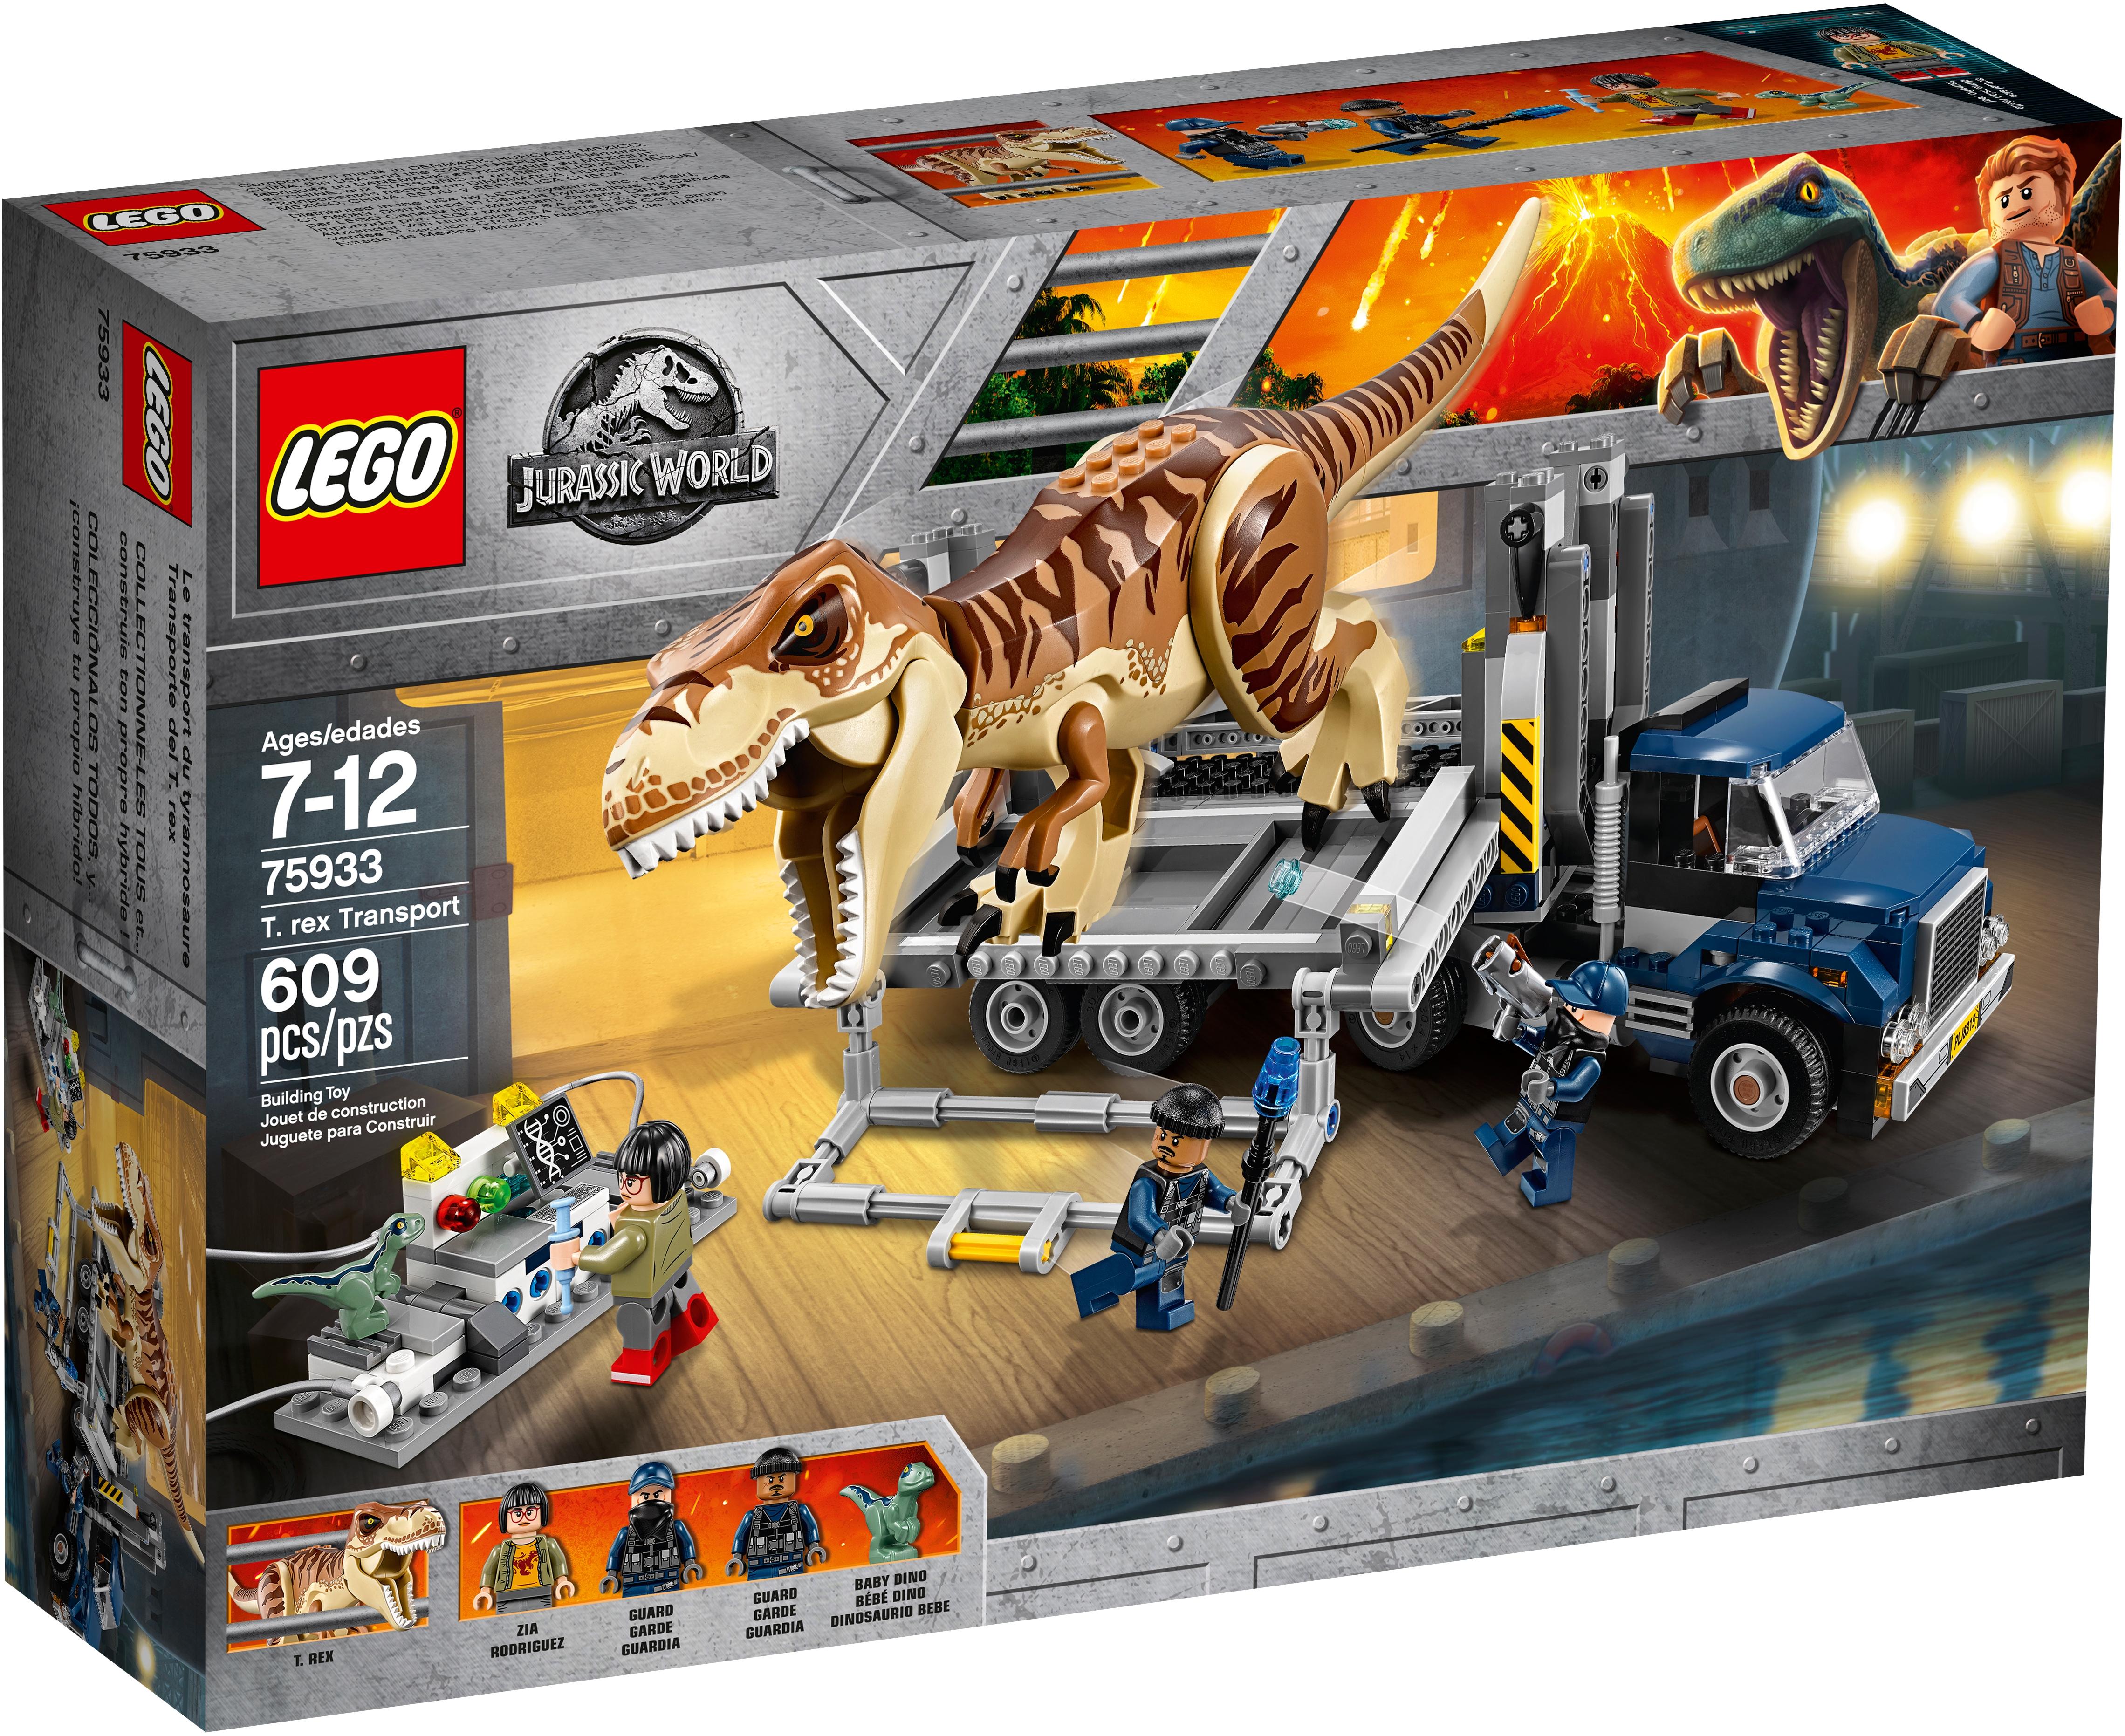 T. rex Transport